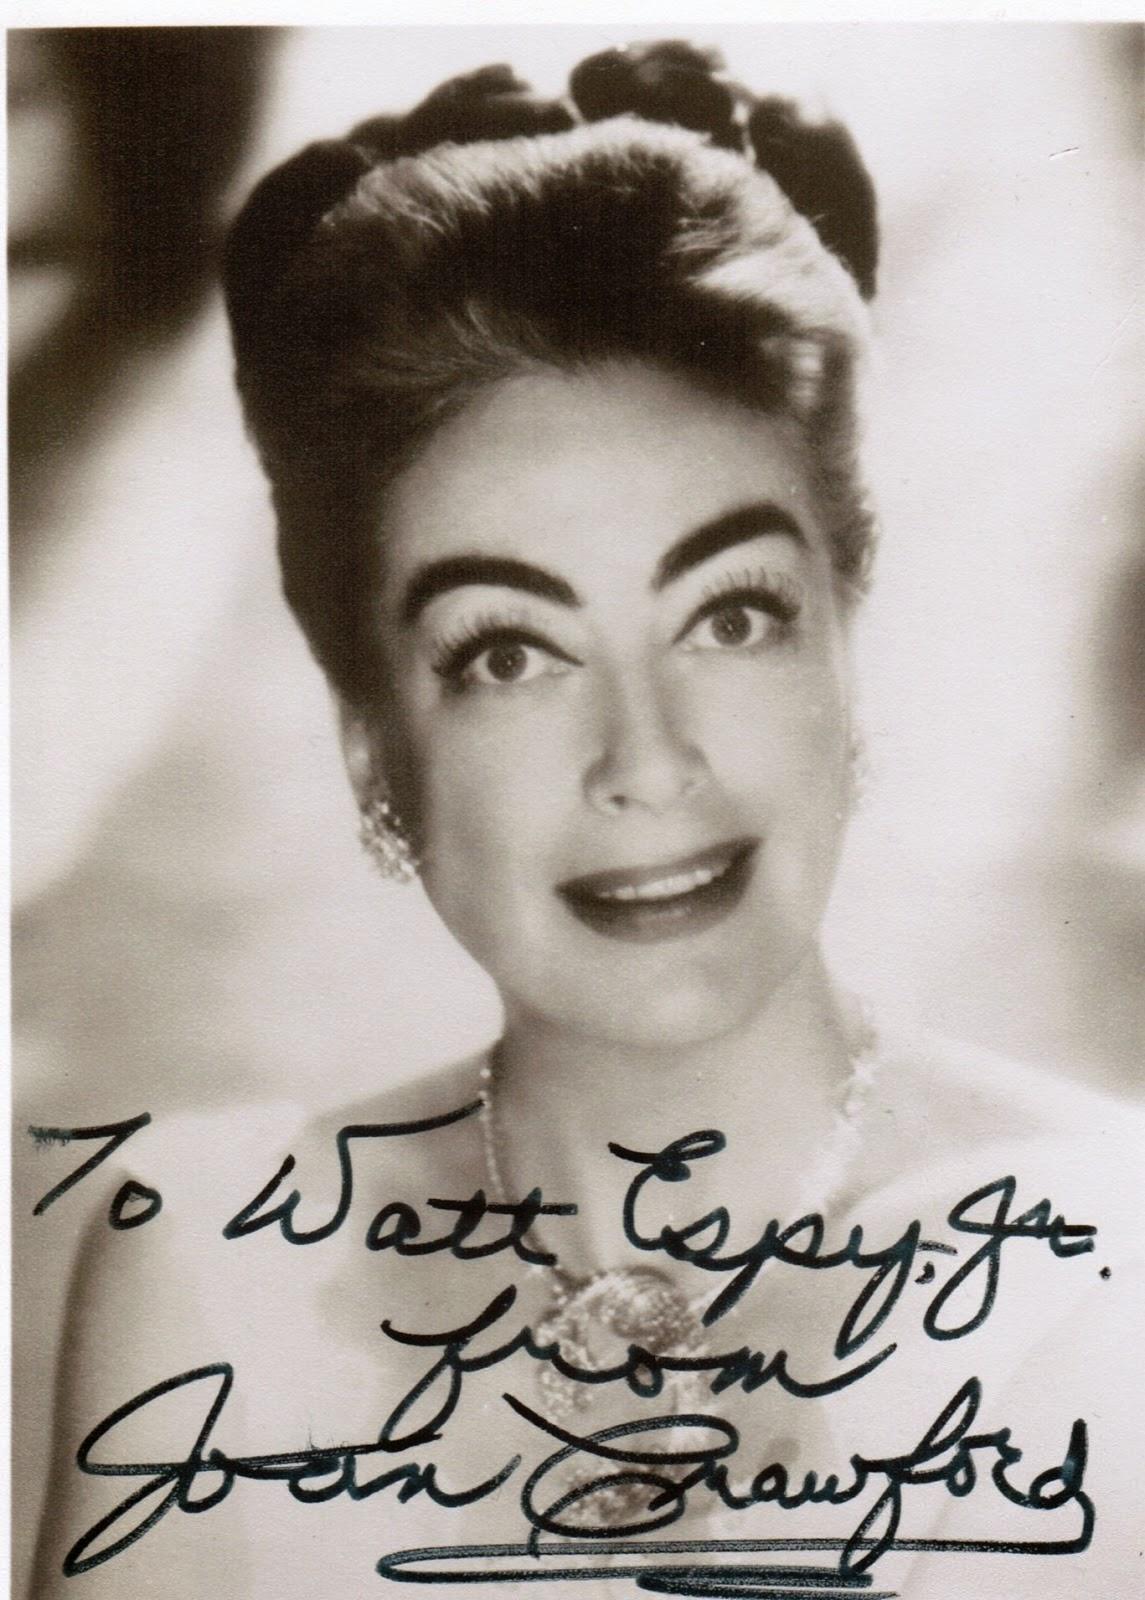 Watt Espy's Autographs